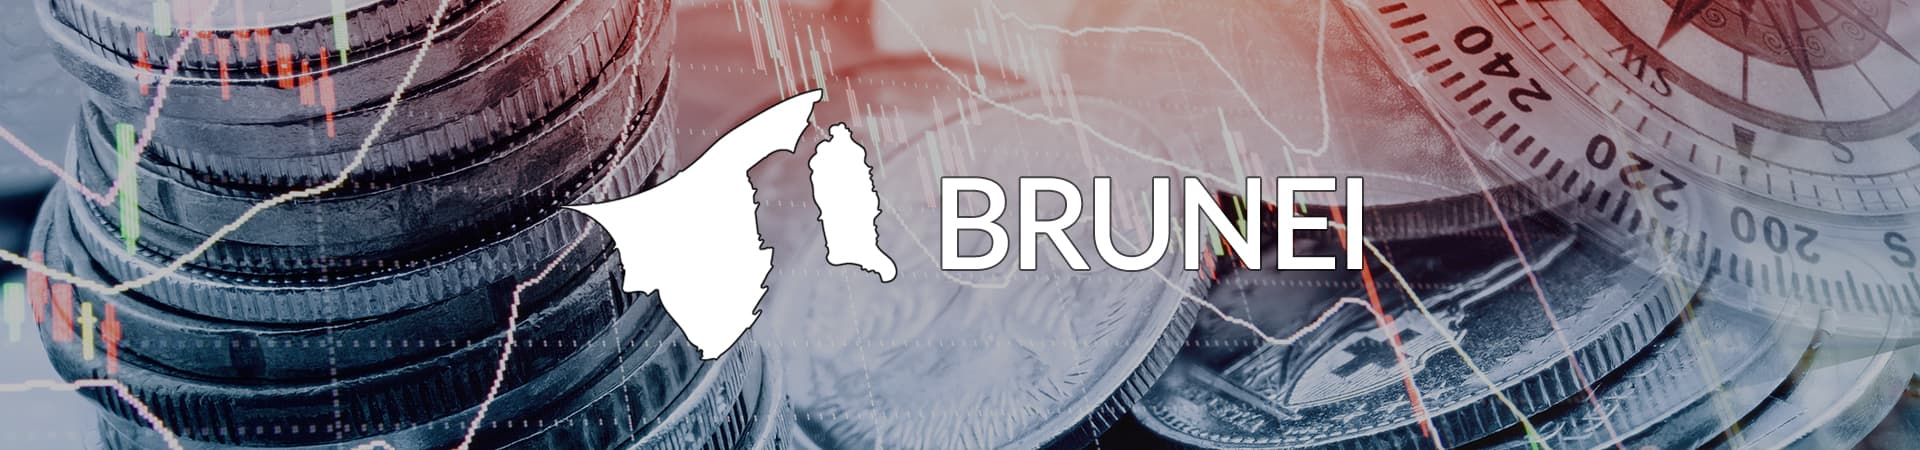 Brunei banking banner